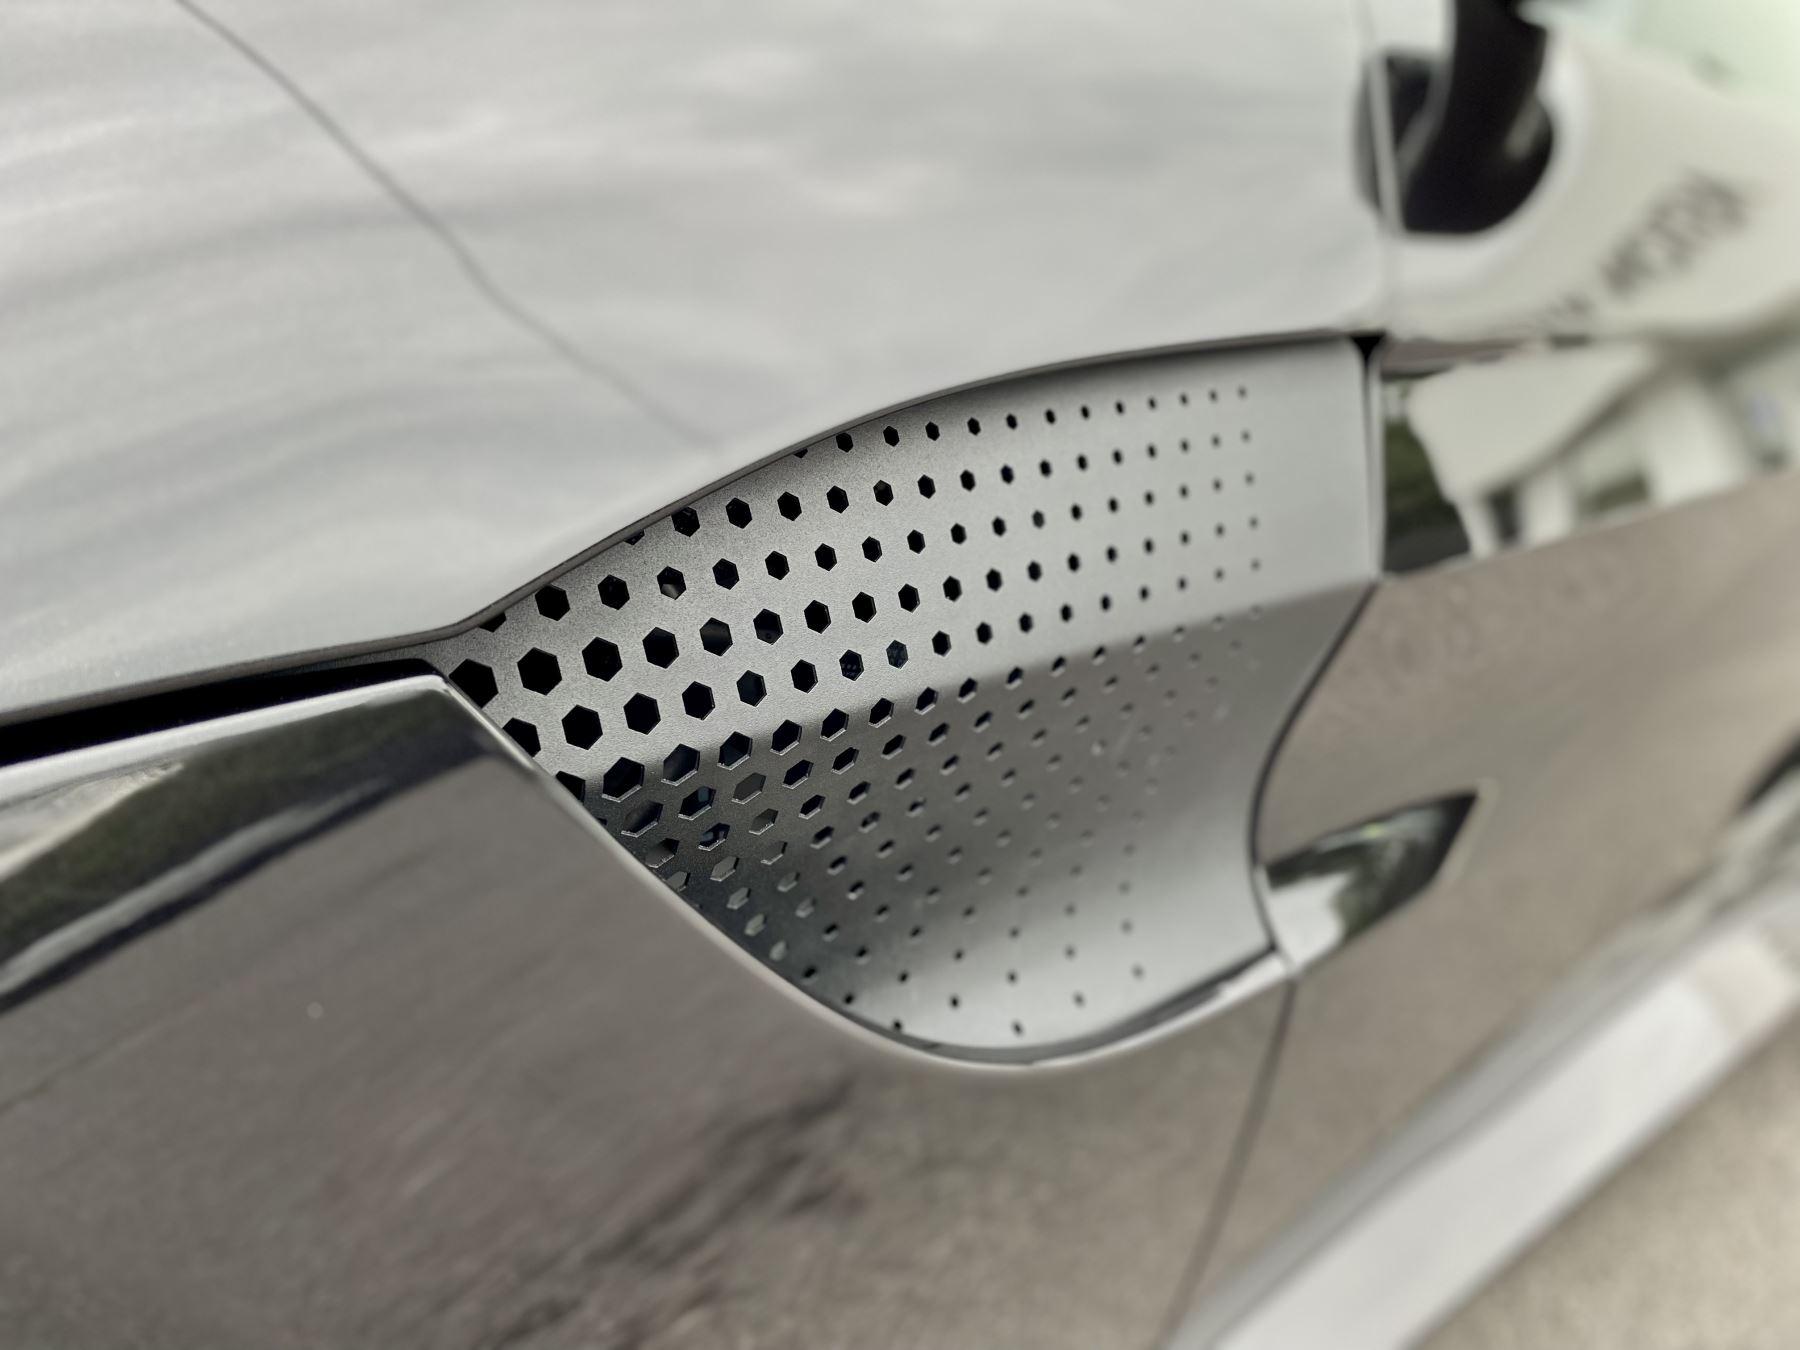 Aston Martin New Vantage 2dr ZF 8 Speed Auto. 4.0 Twin Turbo ZF Gearbox  Reversing Camera Heated Seats Ceramic Brakes image 19